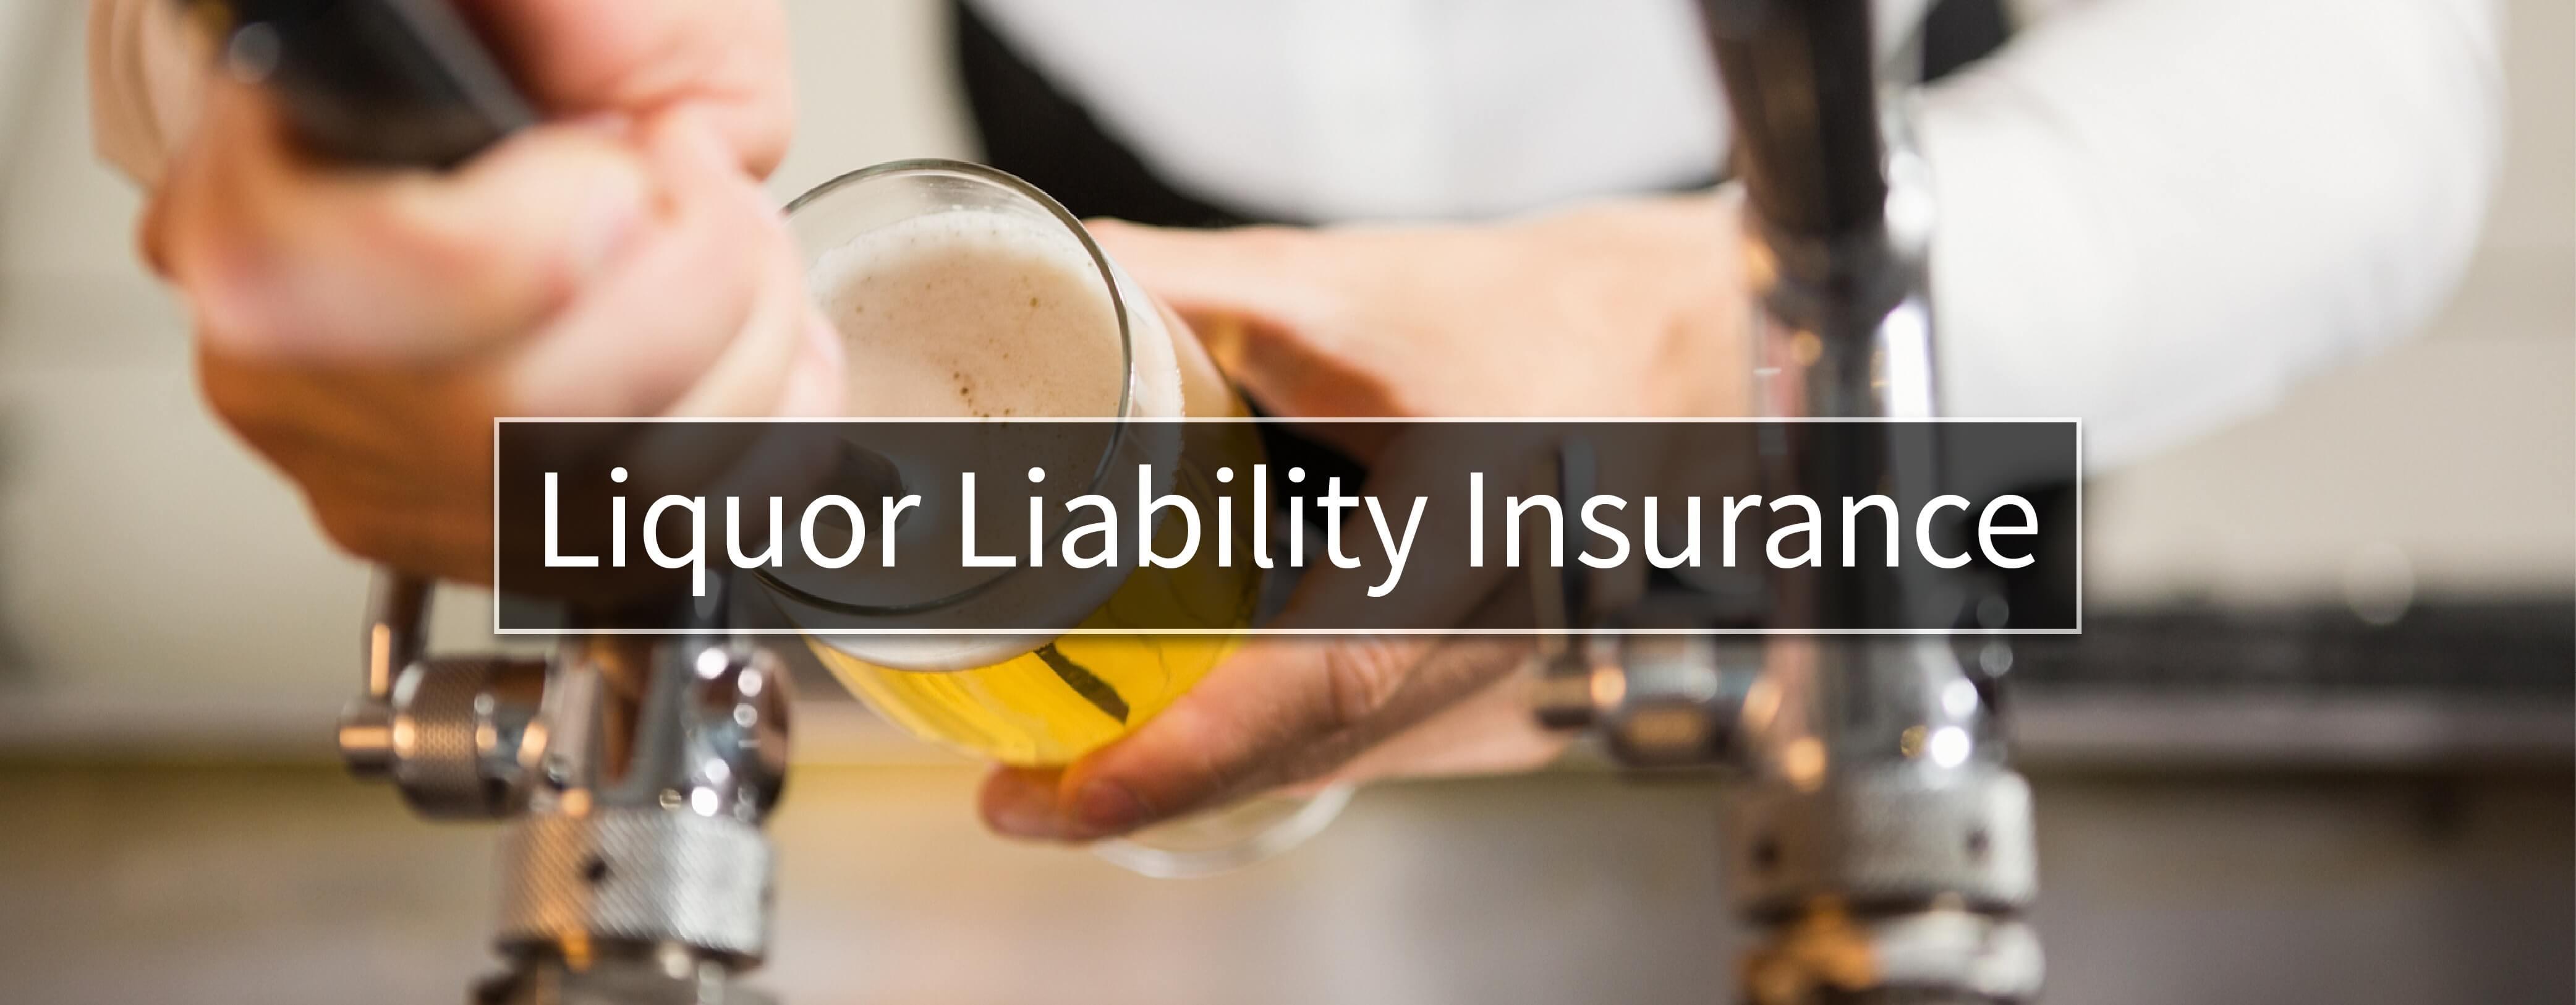 Liquor Liability Insurance Massachusetts